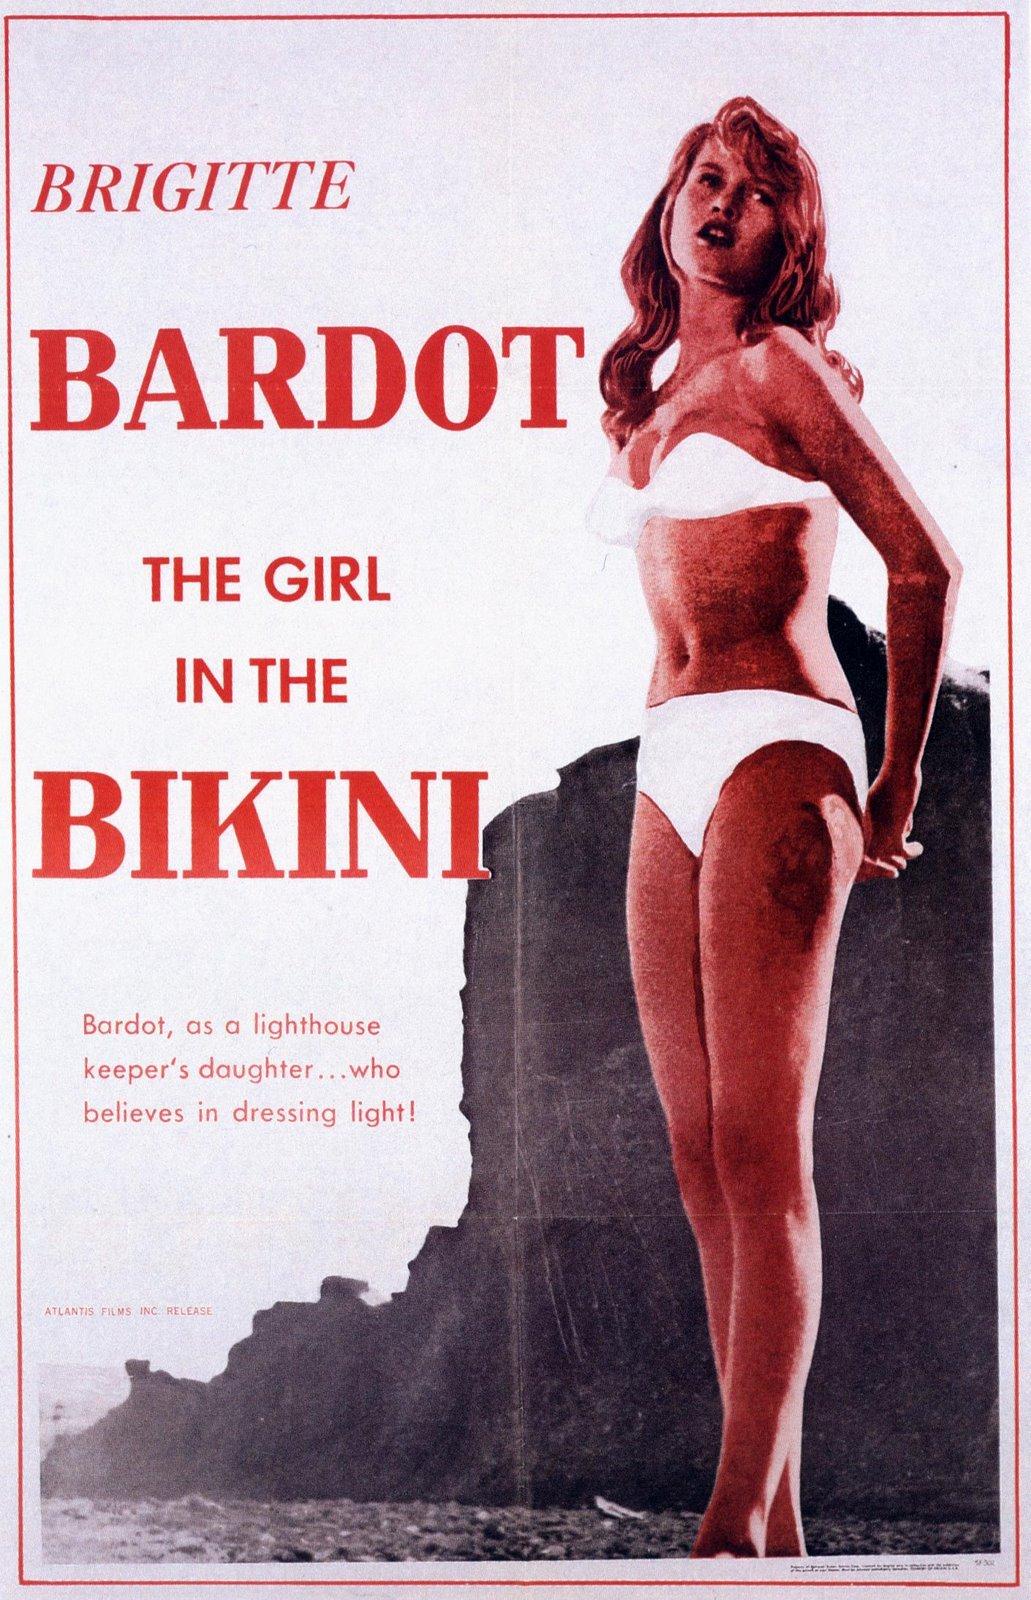 http://1.bp.blogspot.com/_ir6h9Q90O7g/TSaqo0qw40I/AAAAAAAAB5k/7mr2YqeAfYE/s1600/Brigitte+Bardot+poster+10.jpg